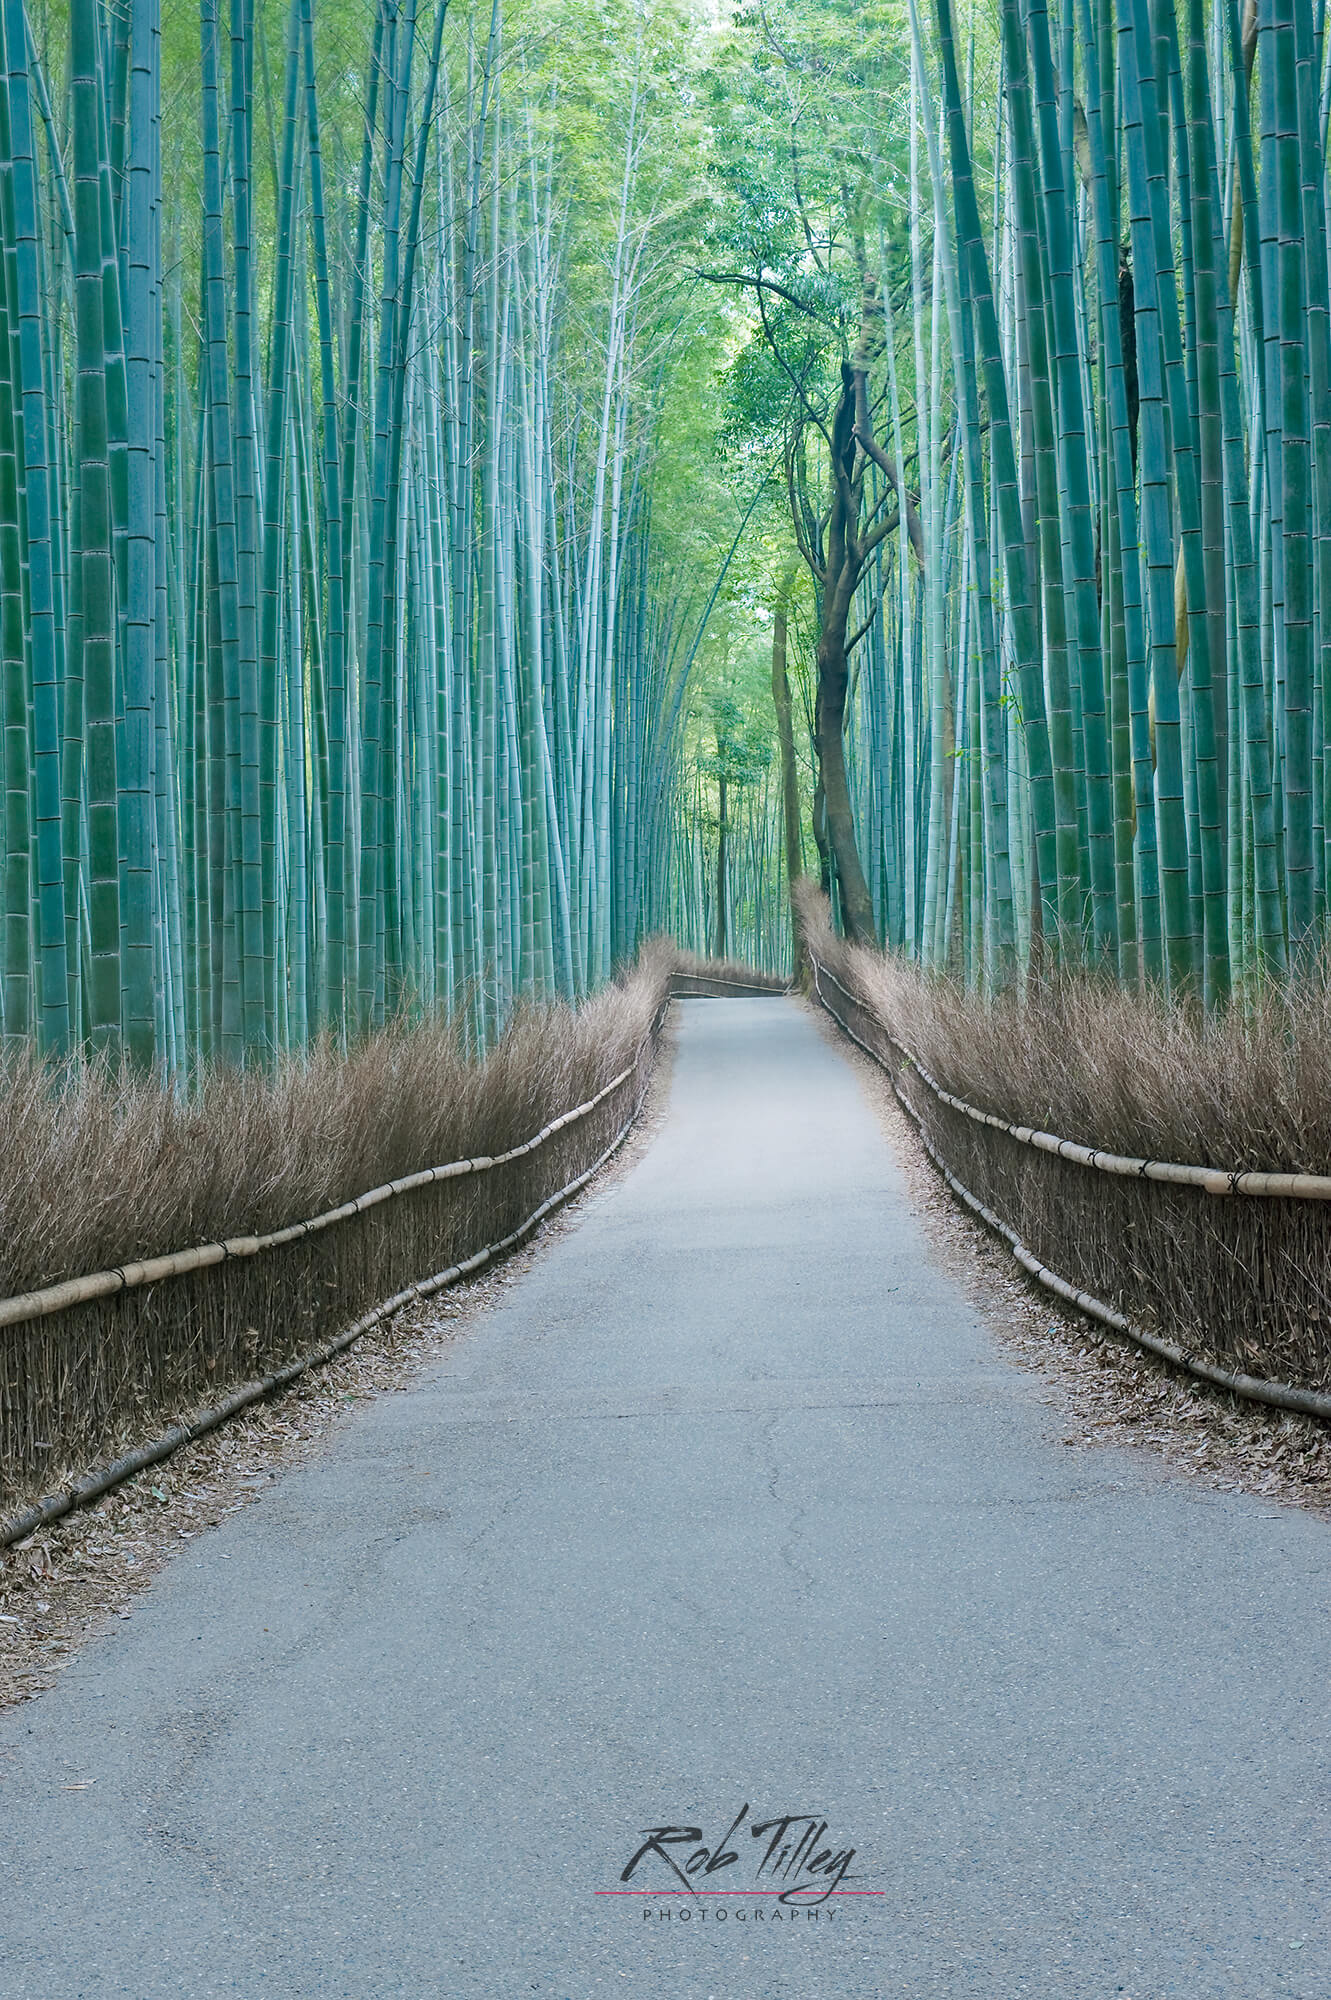 Sagano Bamboo Forest II